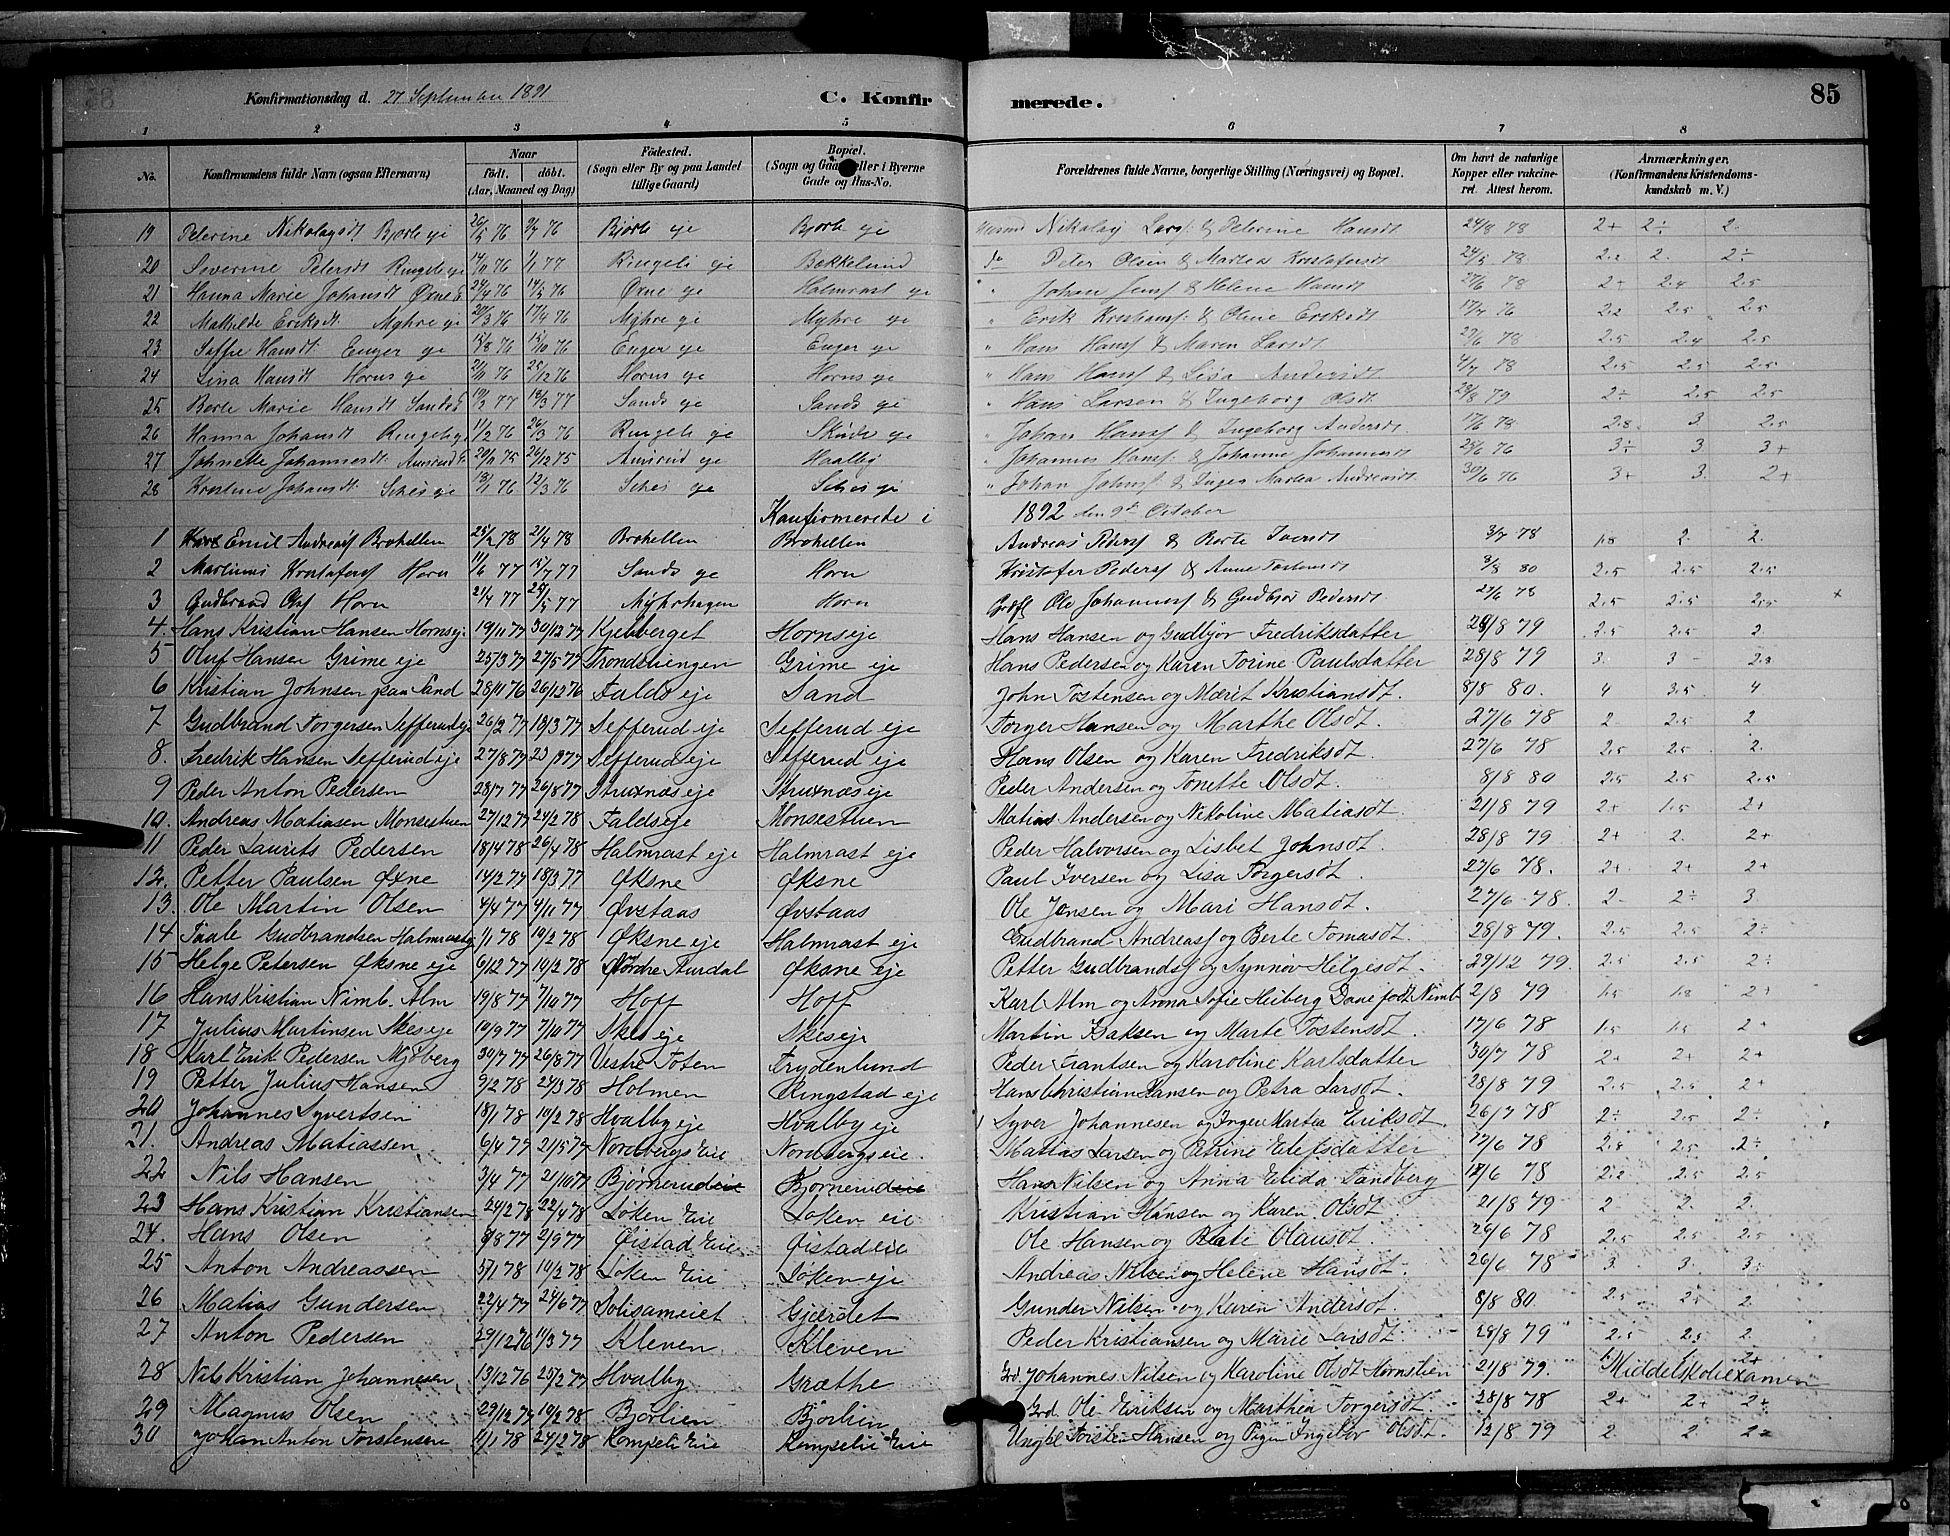 SAH, Søndre Land prestekontor, L/L0002: Klokkerbok nr. 2, 1884-1900, s. 85